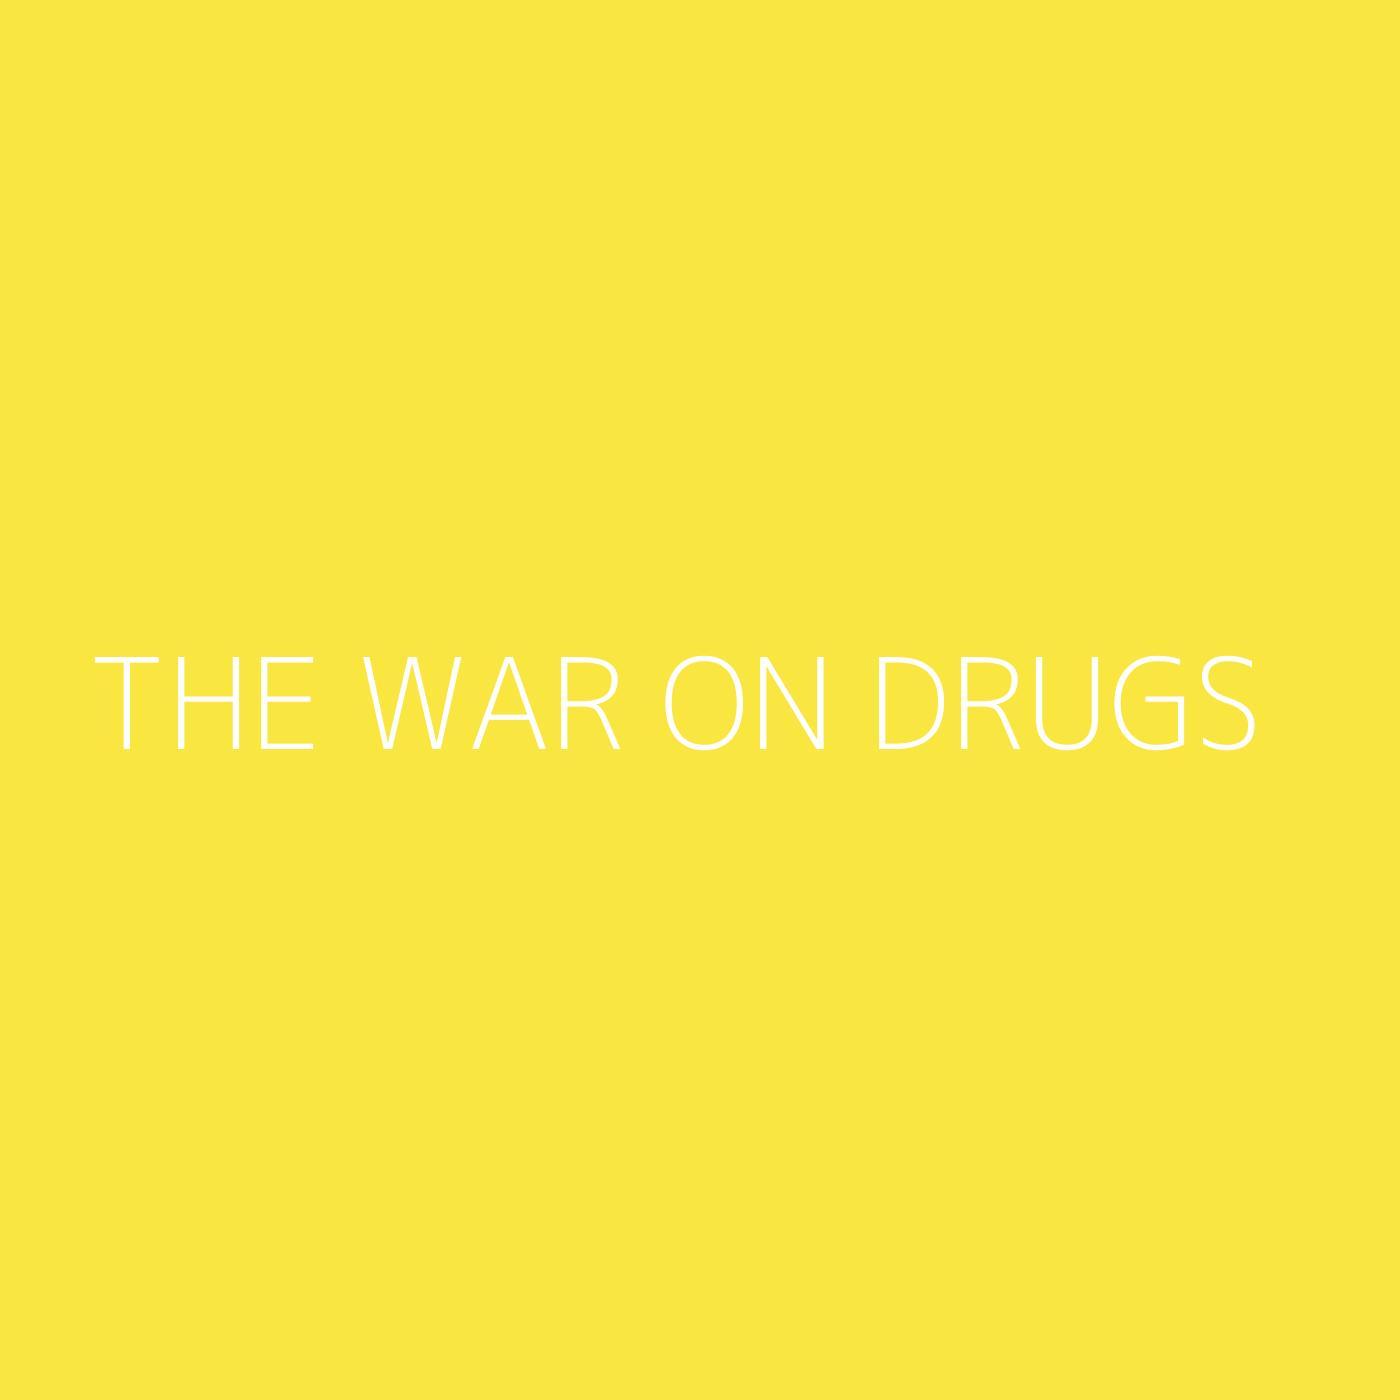 The War On Drugs Playlist Artwork